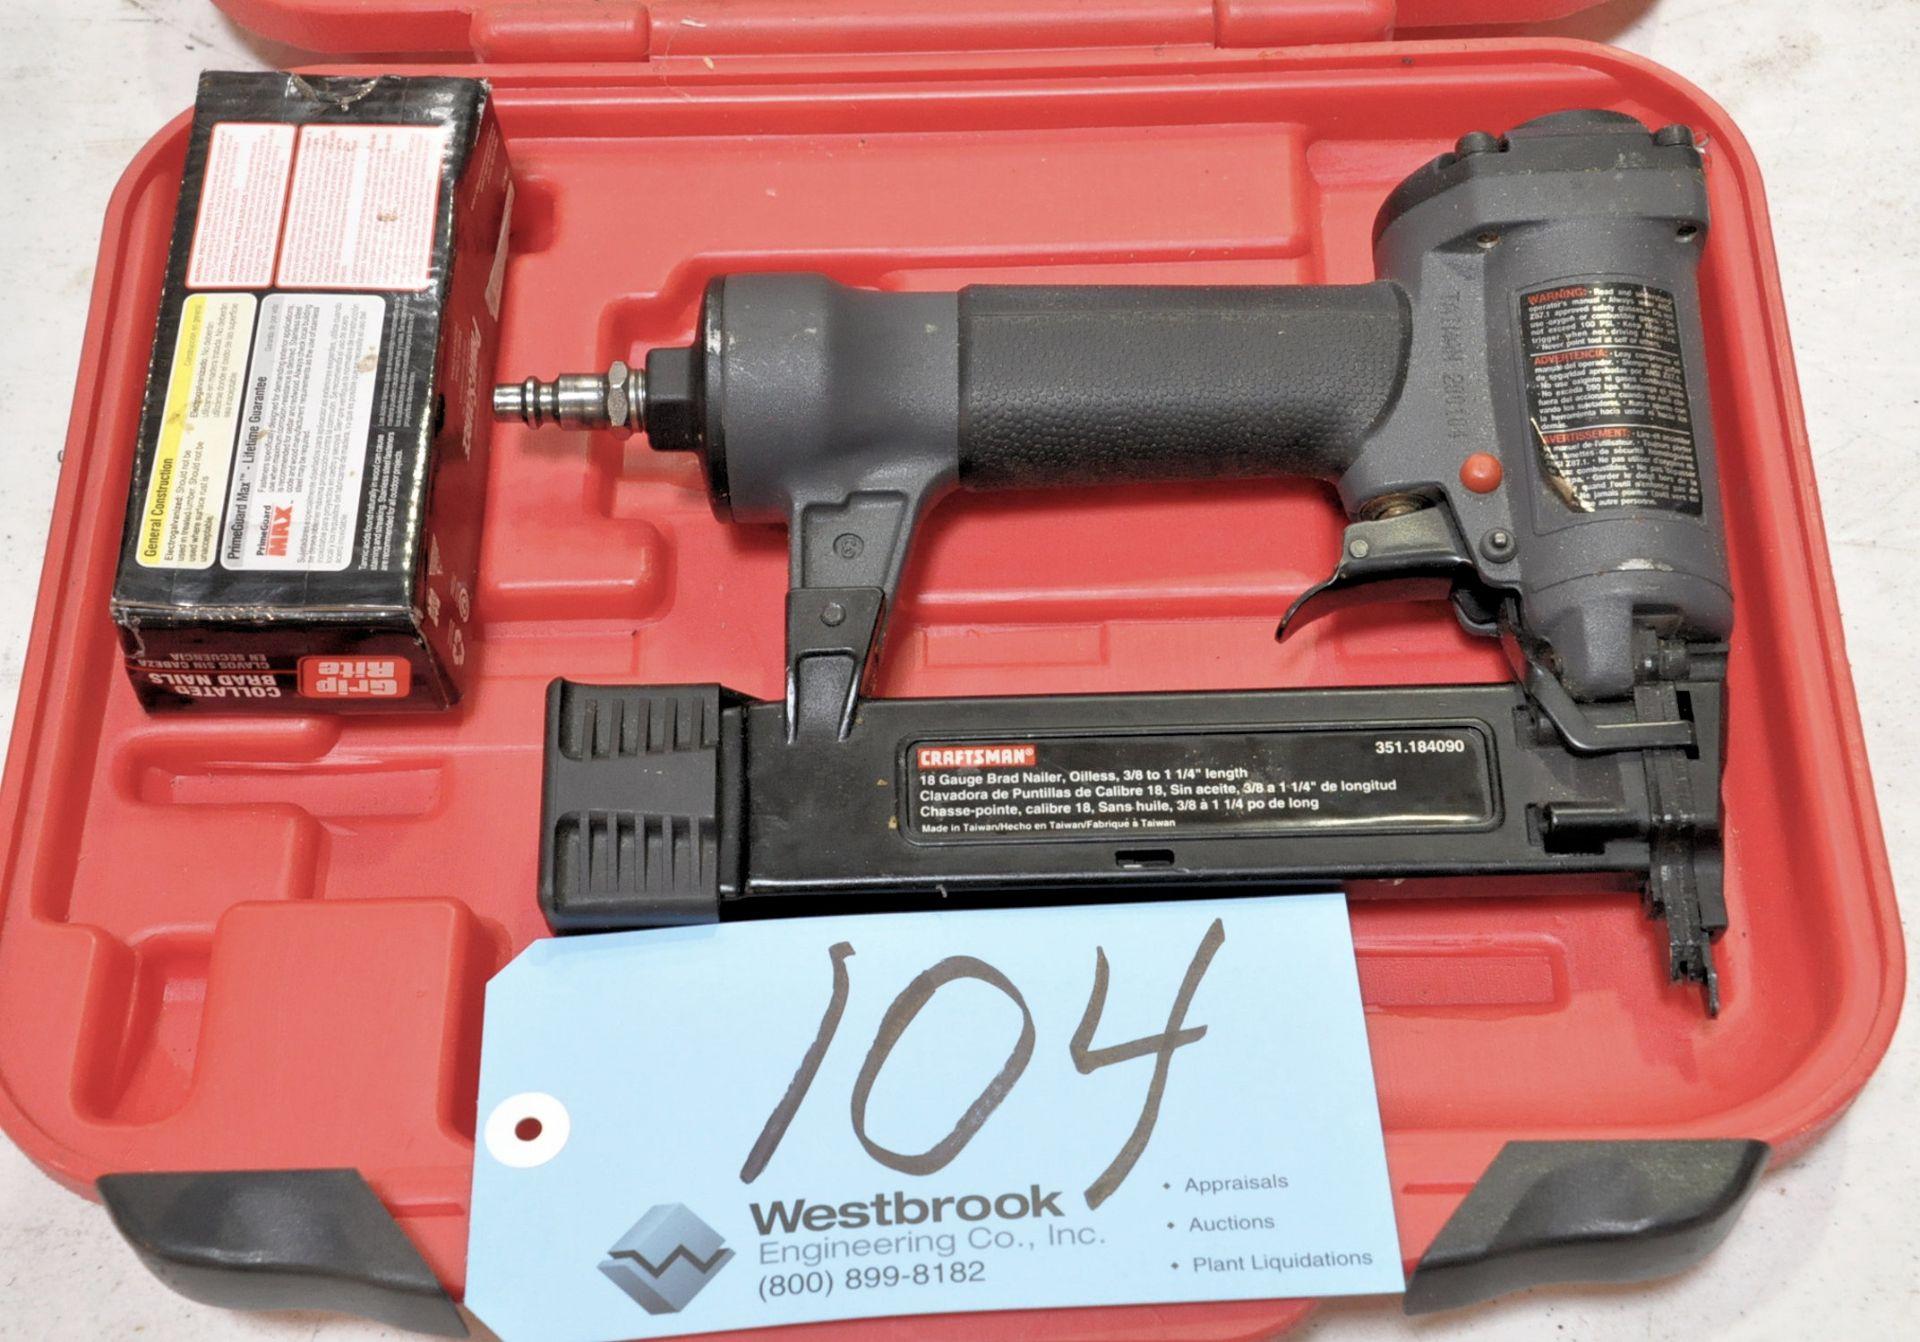 Lot 104 - Craftsman Pneumatic Finish Nailer Gun with Supply and Case